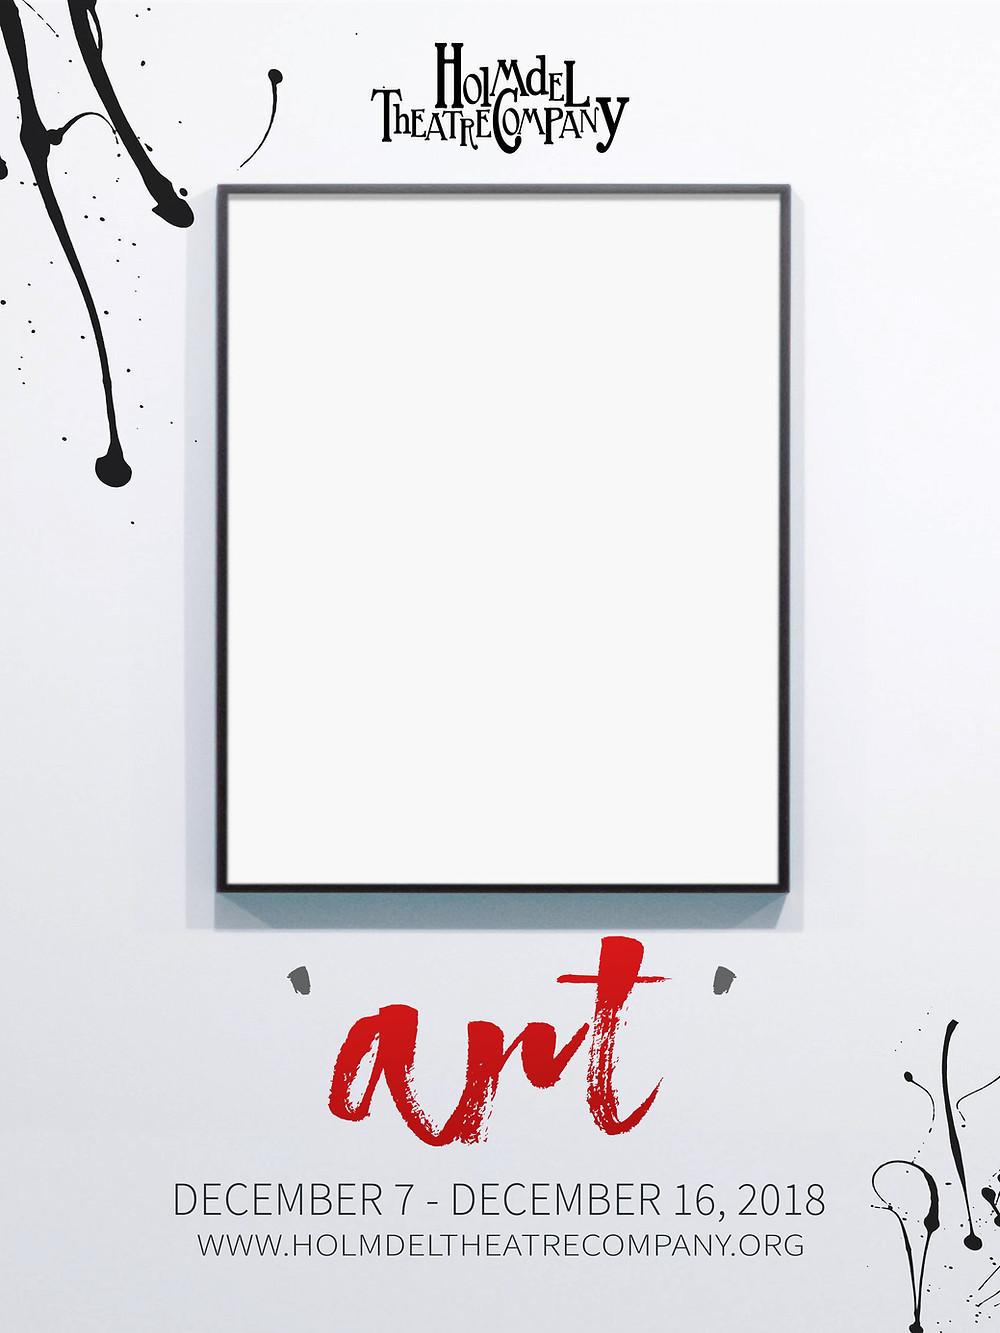 'ART' Poster